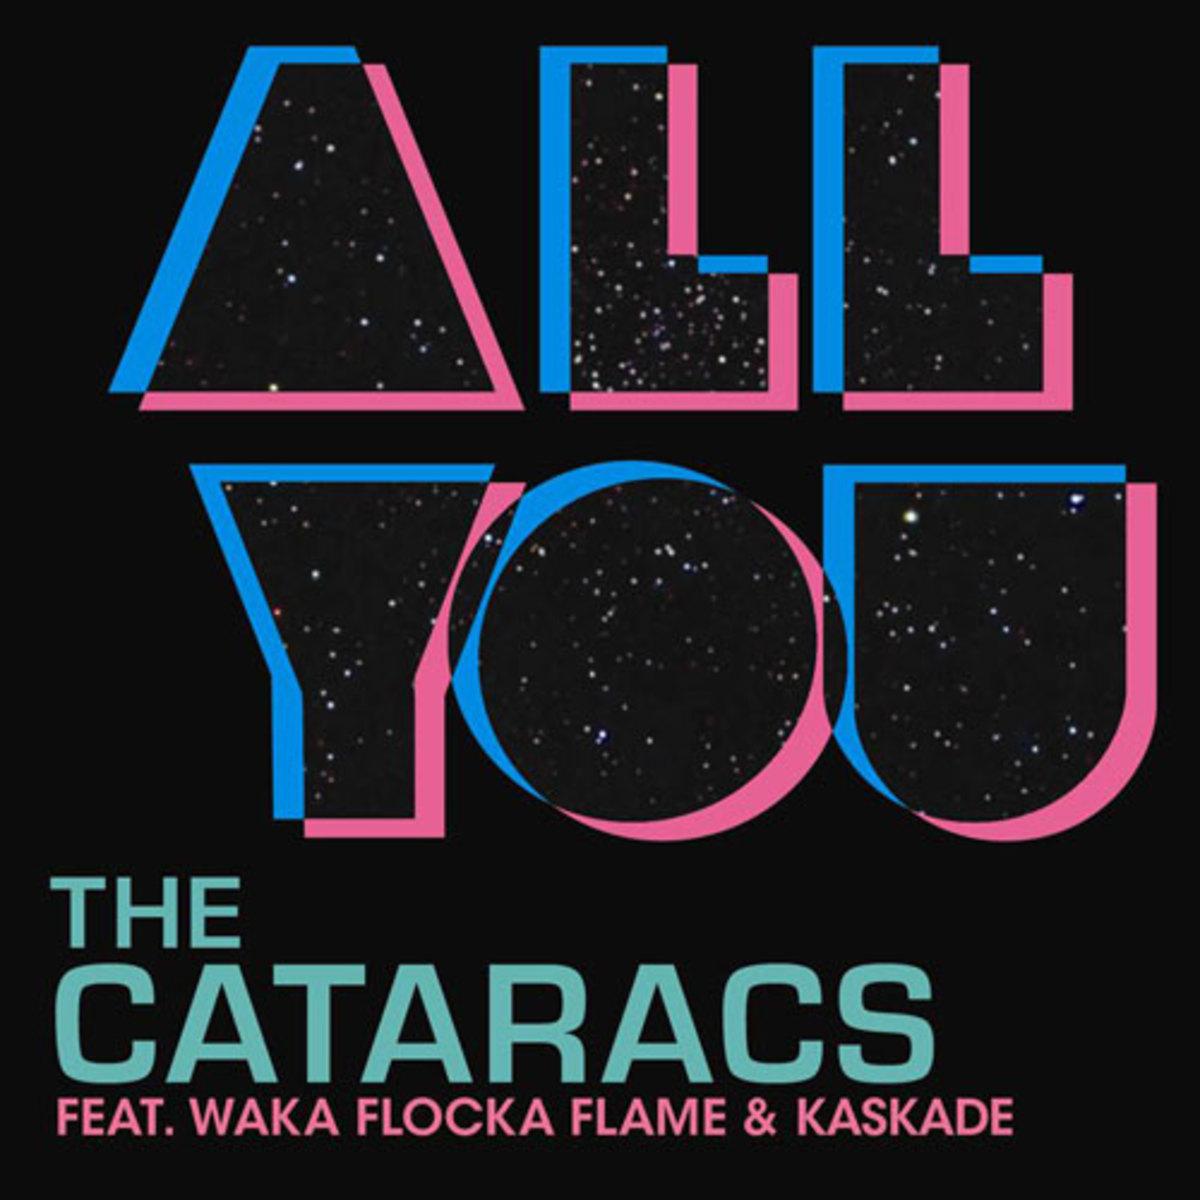 thecataracs-allyou.jpg